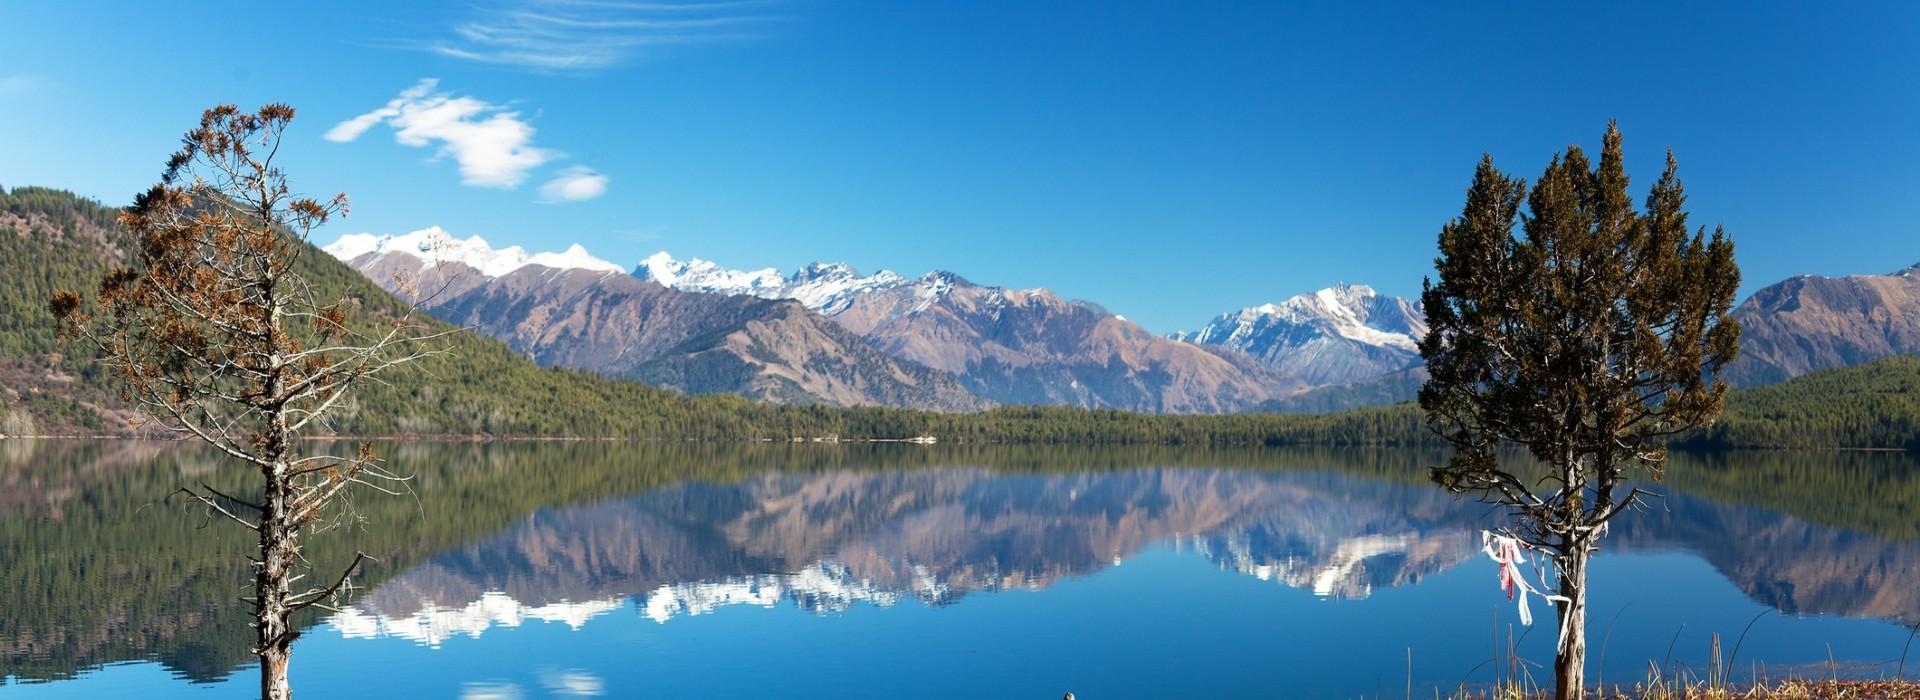 Travelling Rara Lake - Tours and Holiday Packages in Rara Lake